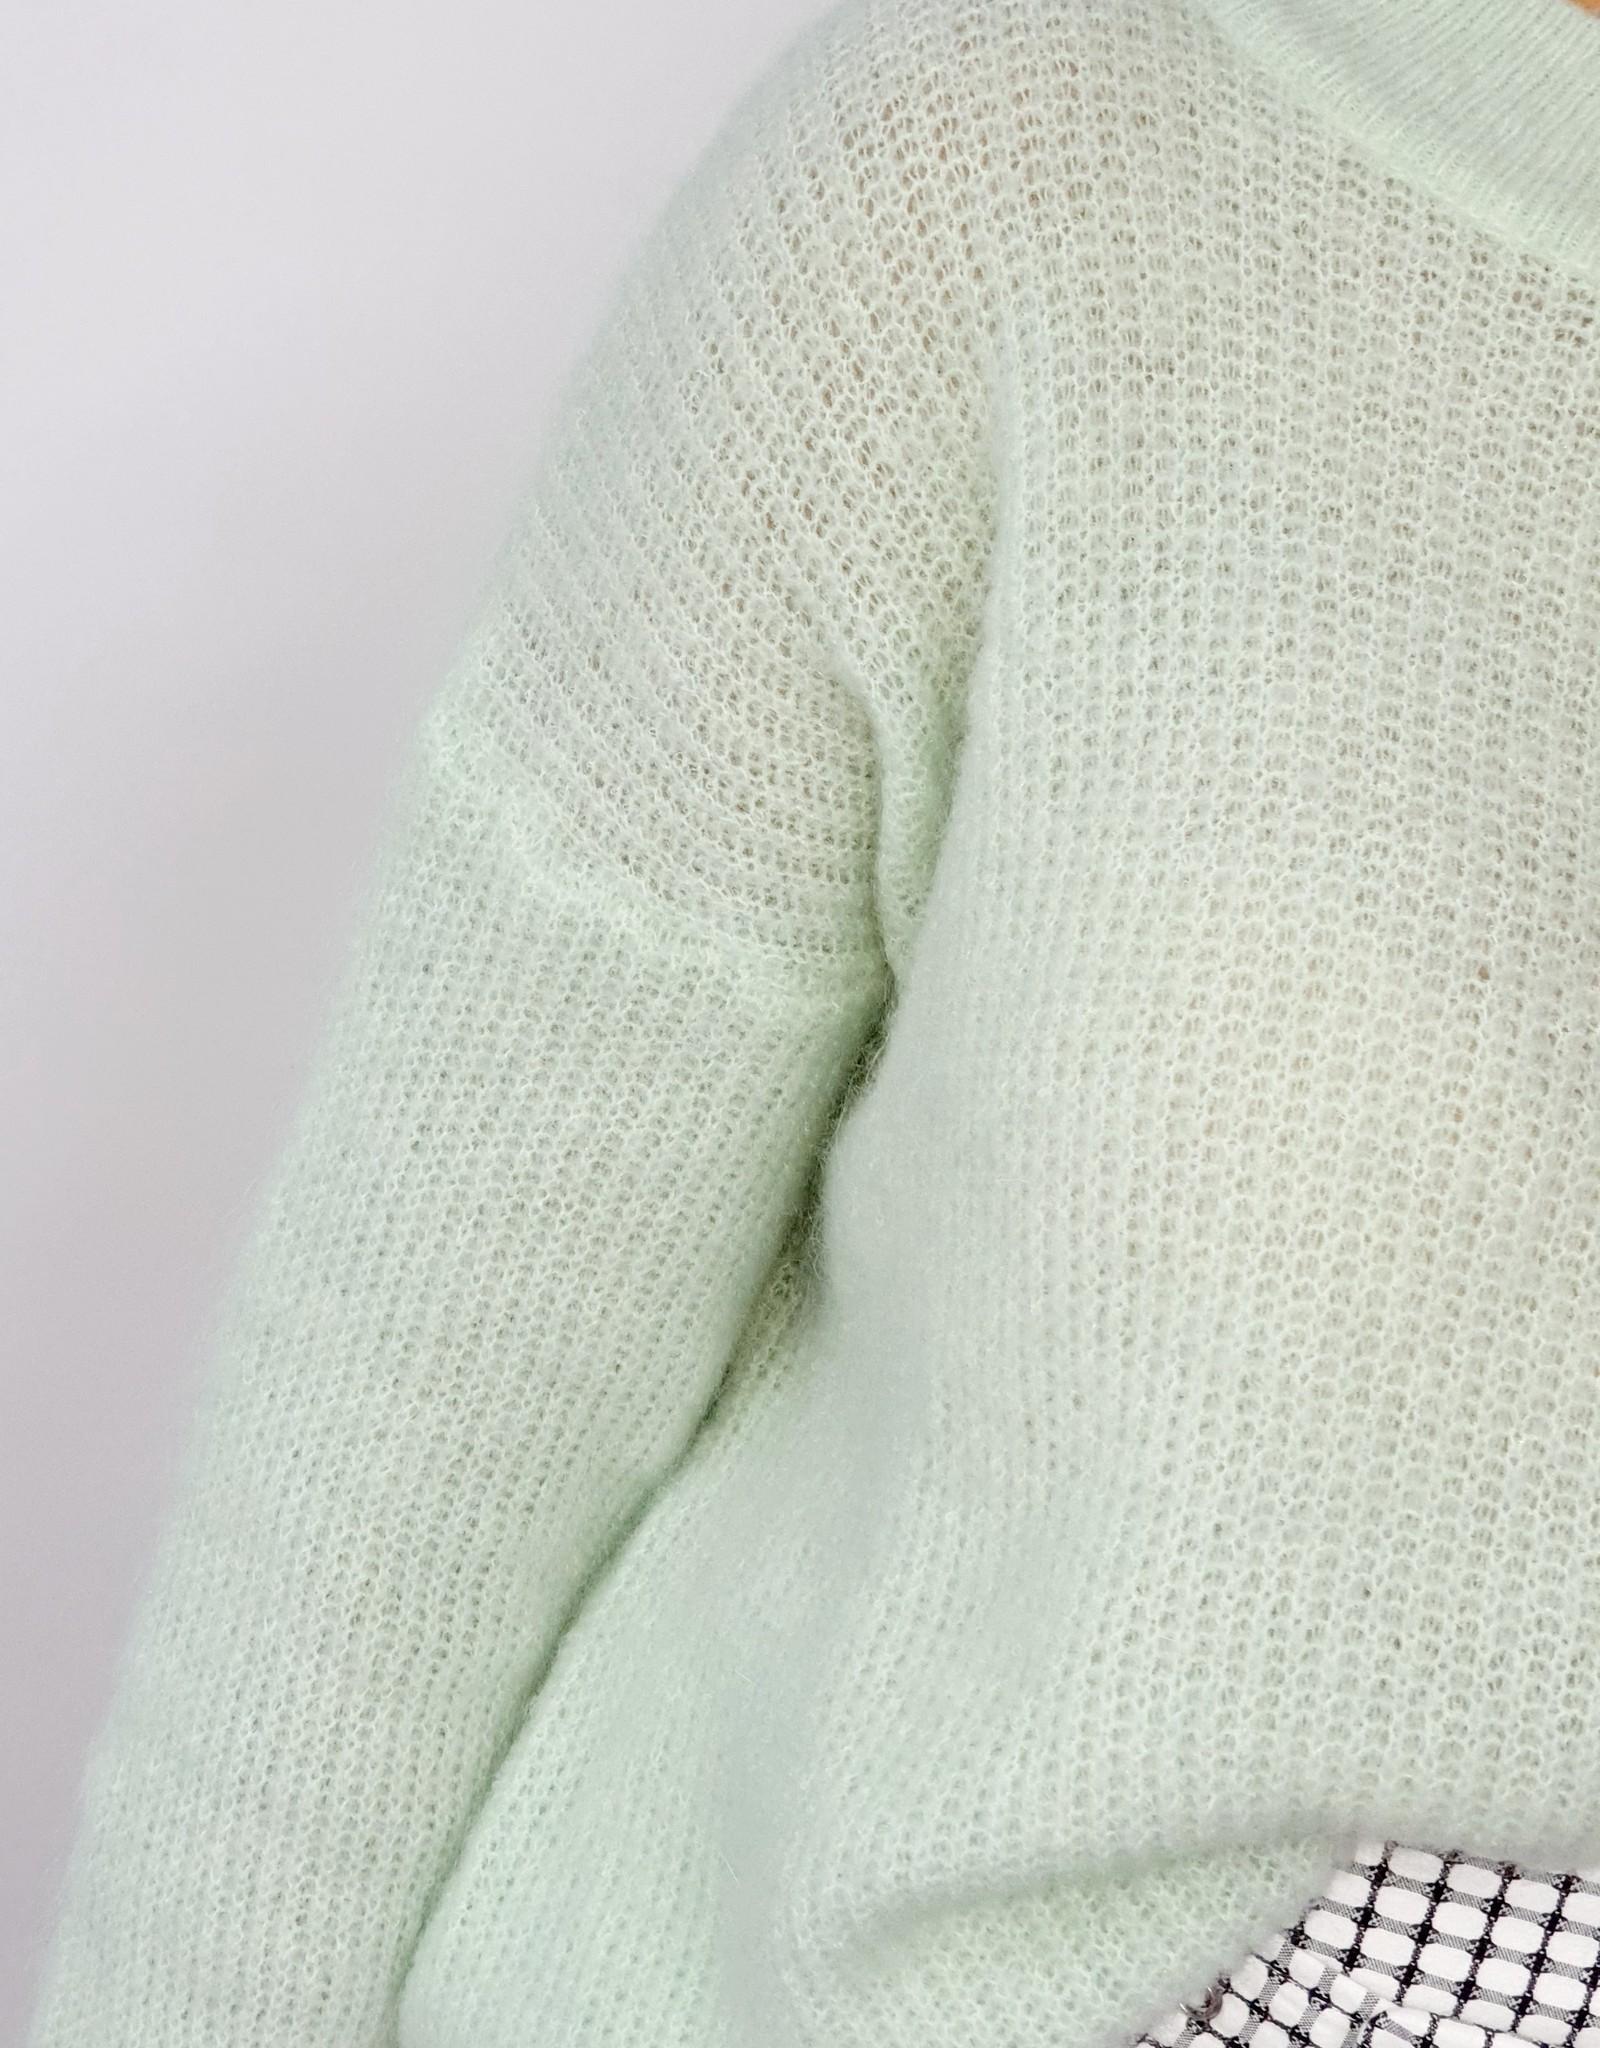 Minty feeling knitted sweater